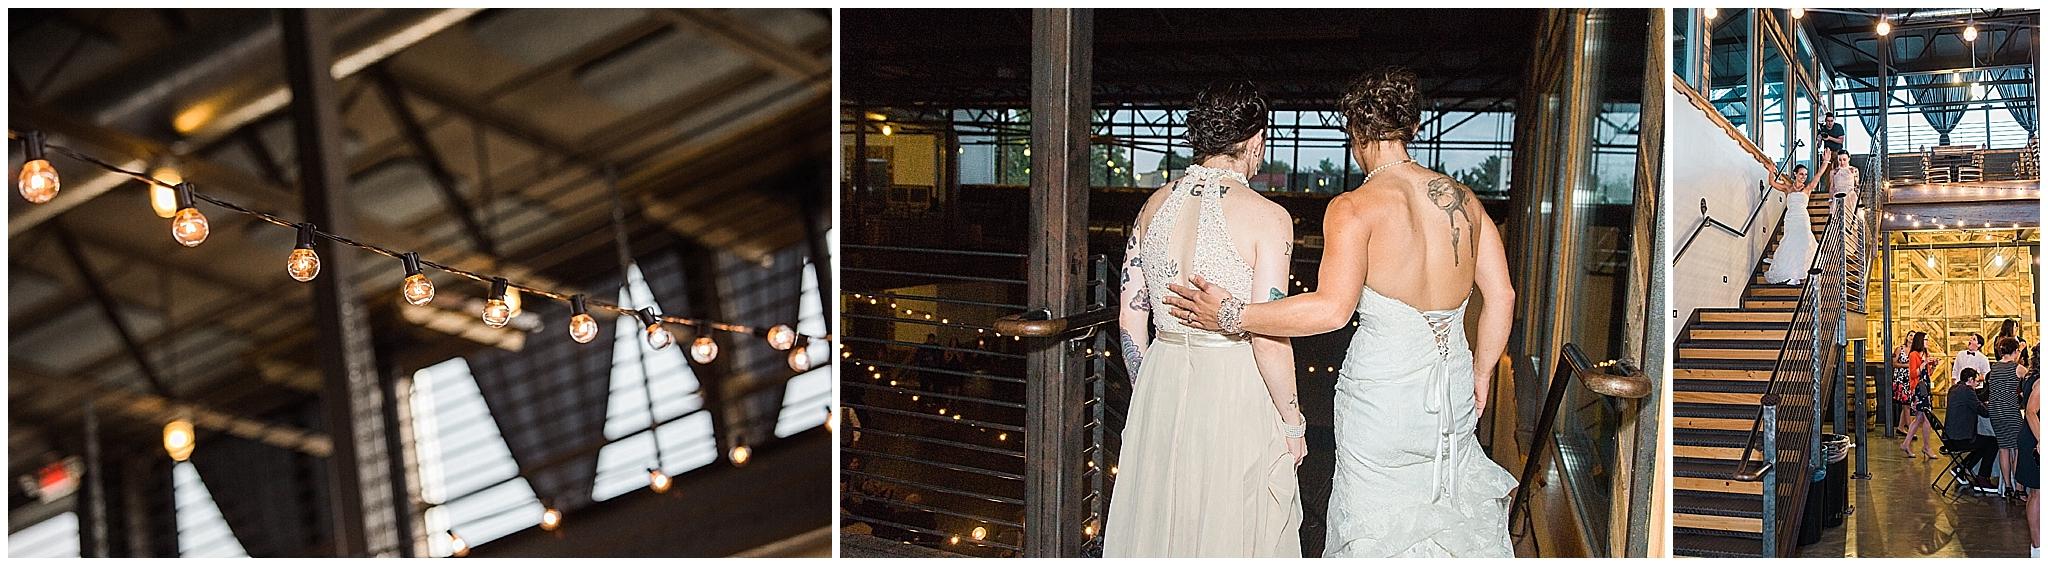 Wedding_Asheville_Highland_Brewing_Photographer_29.jpg